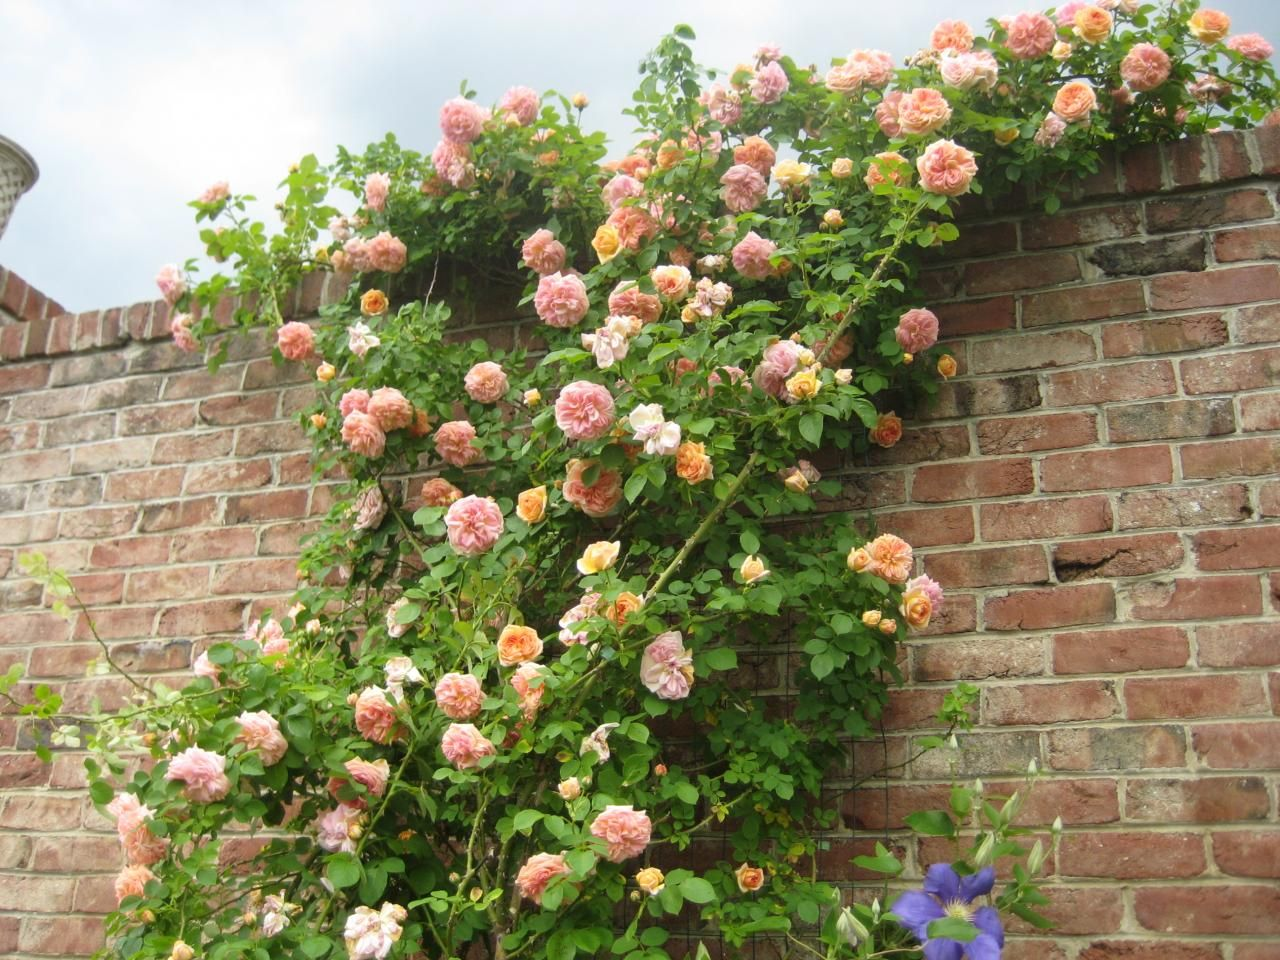 Climbing Roses And An Old Brick Wall